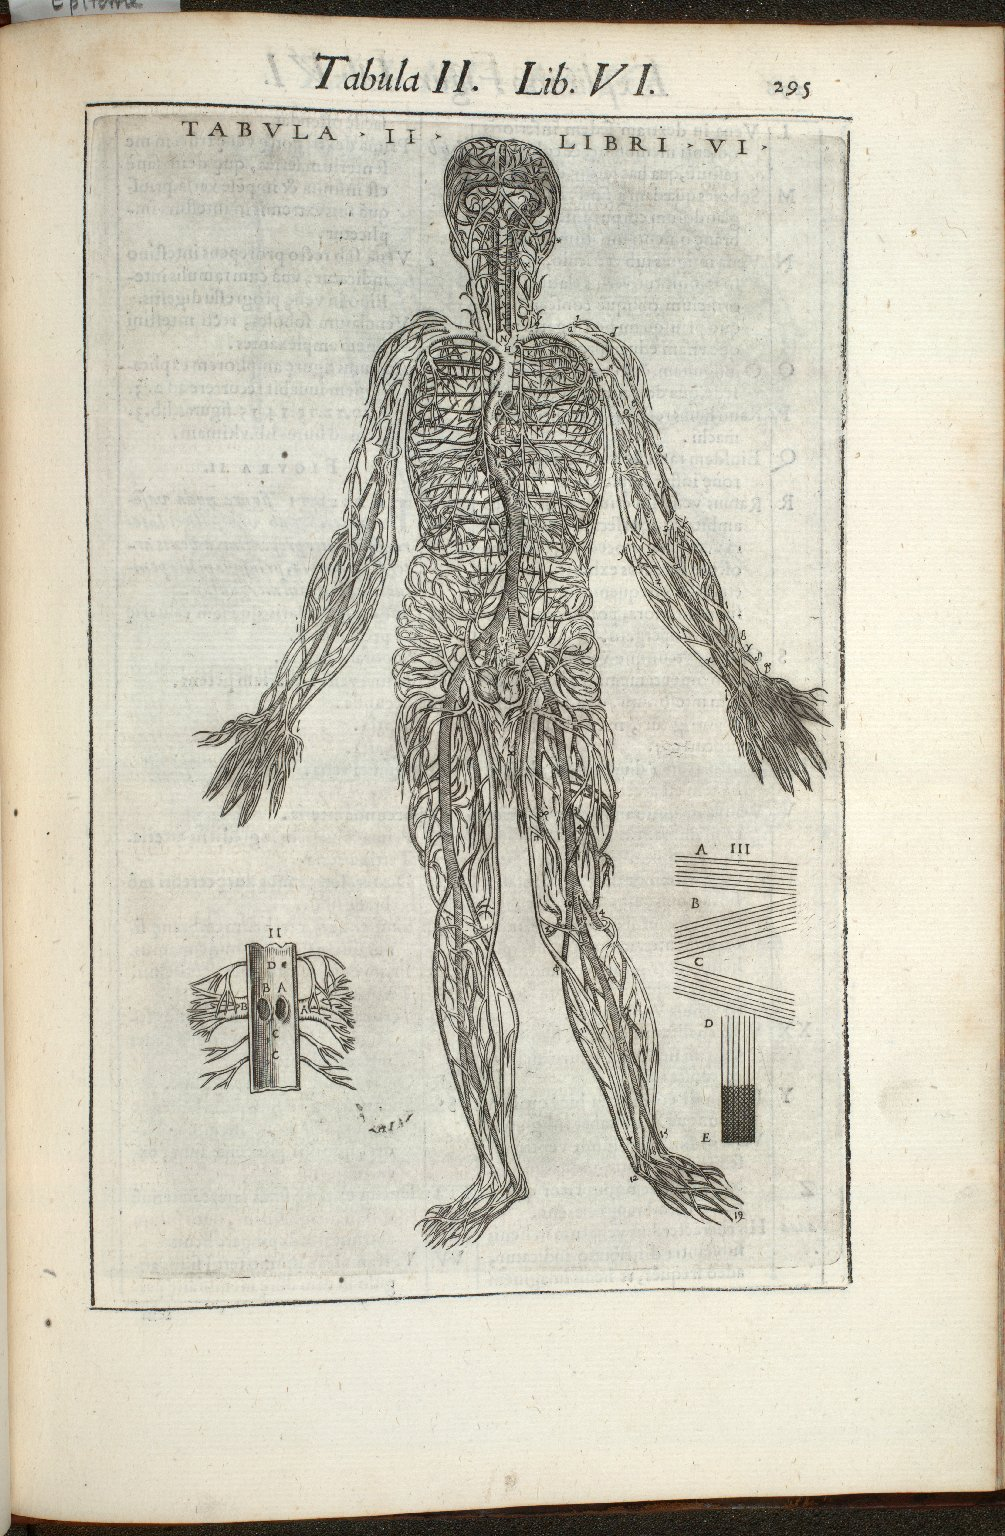 Tabula II. Libri VI.